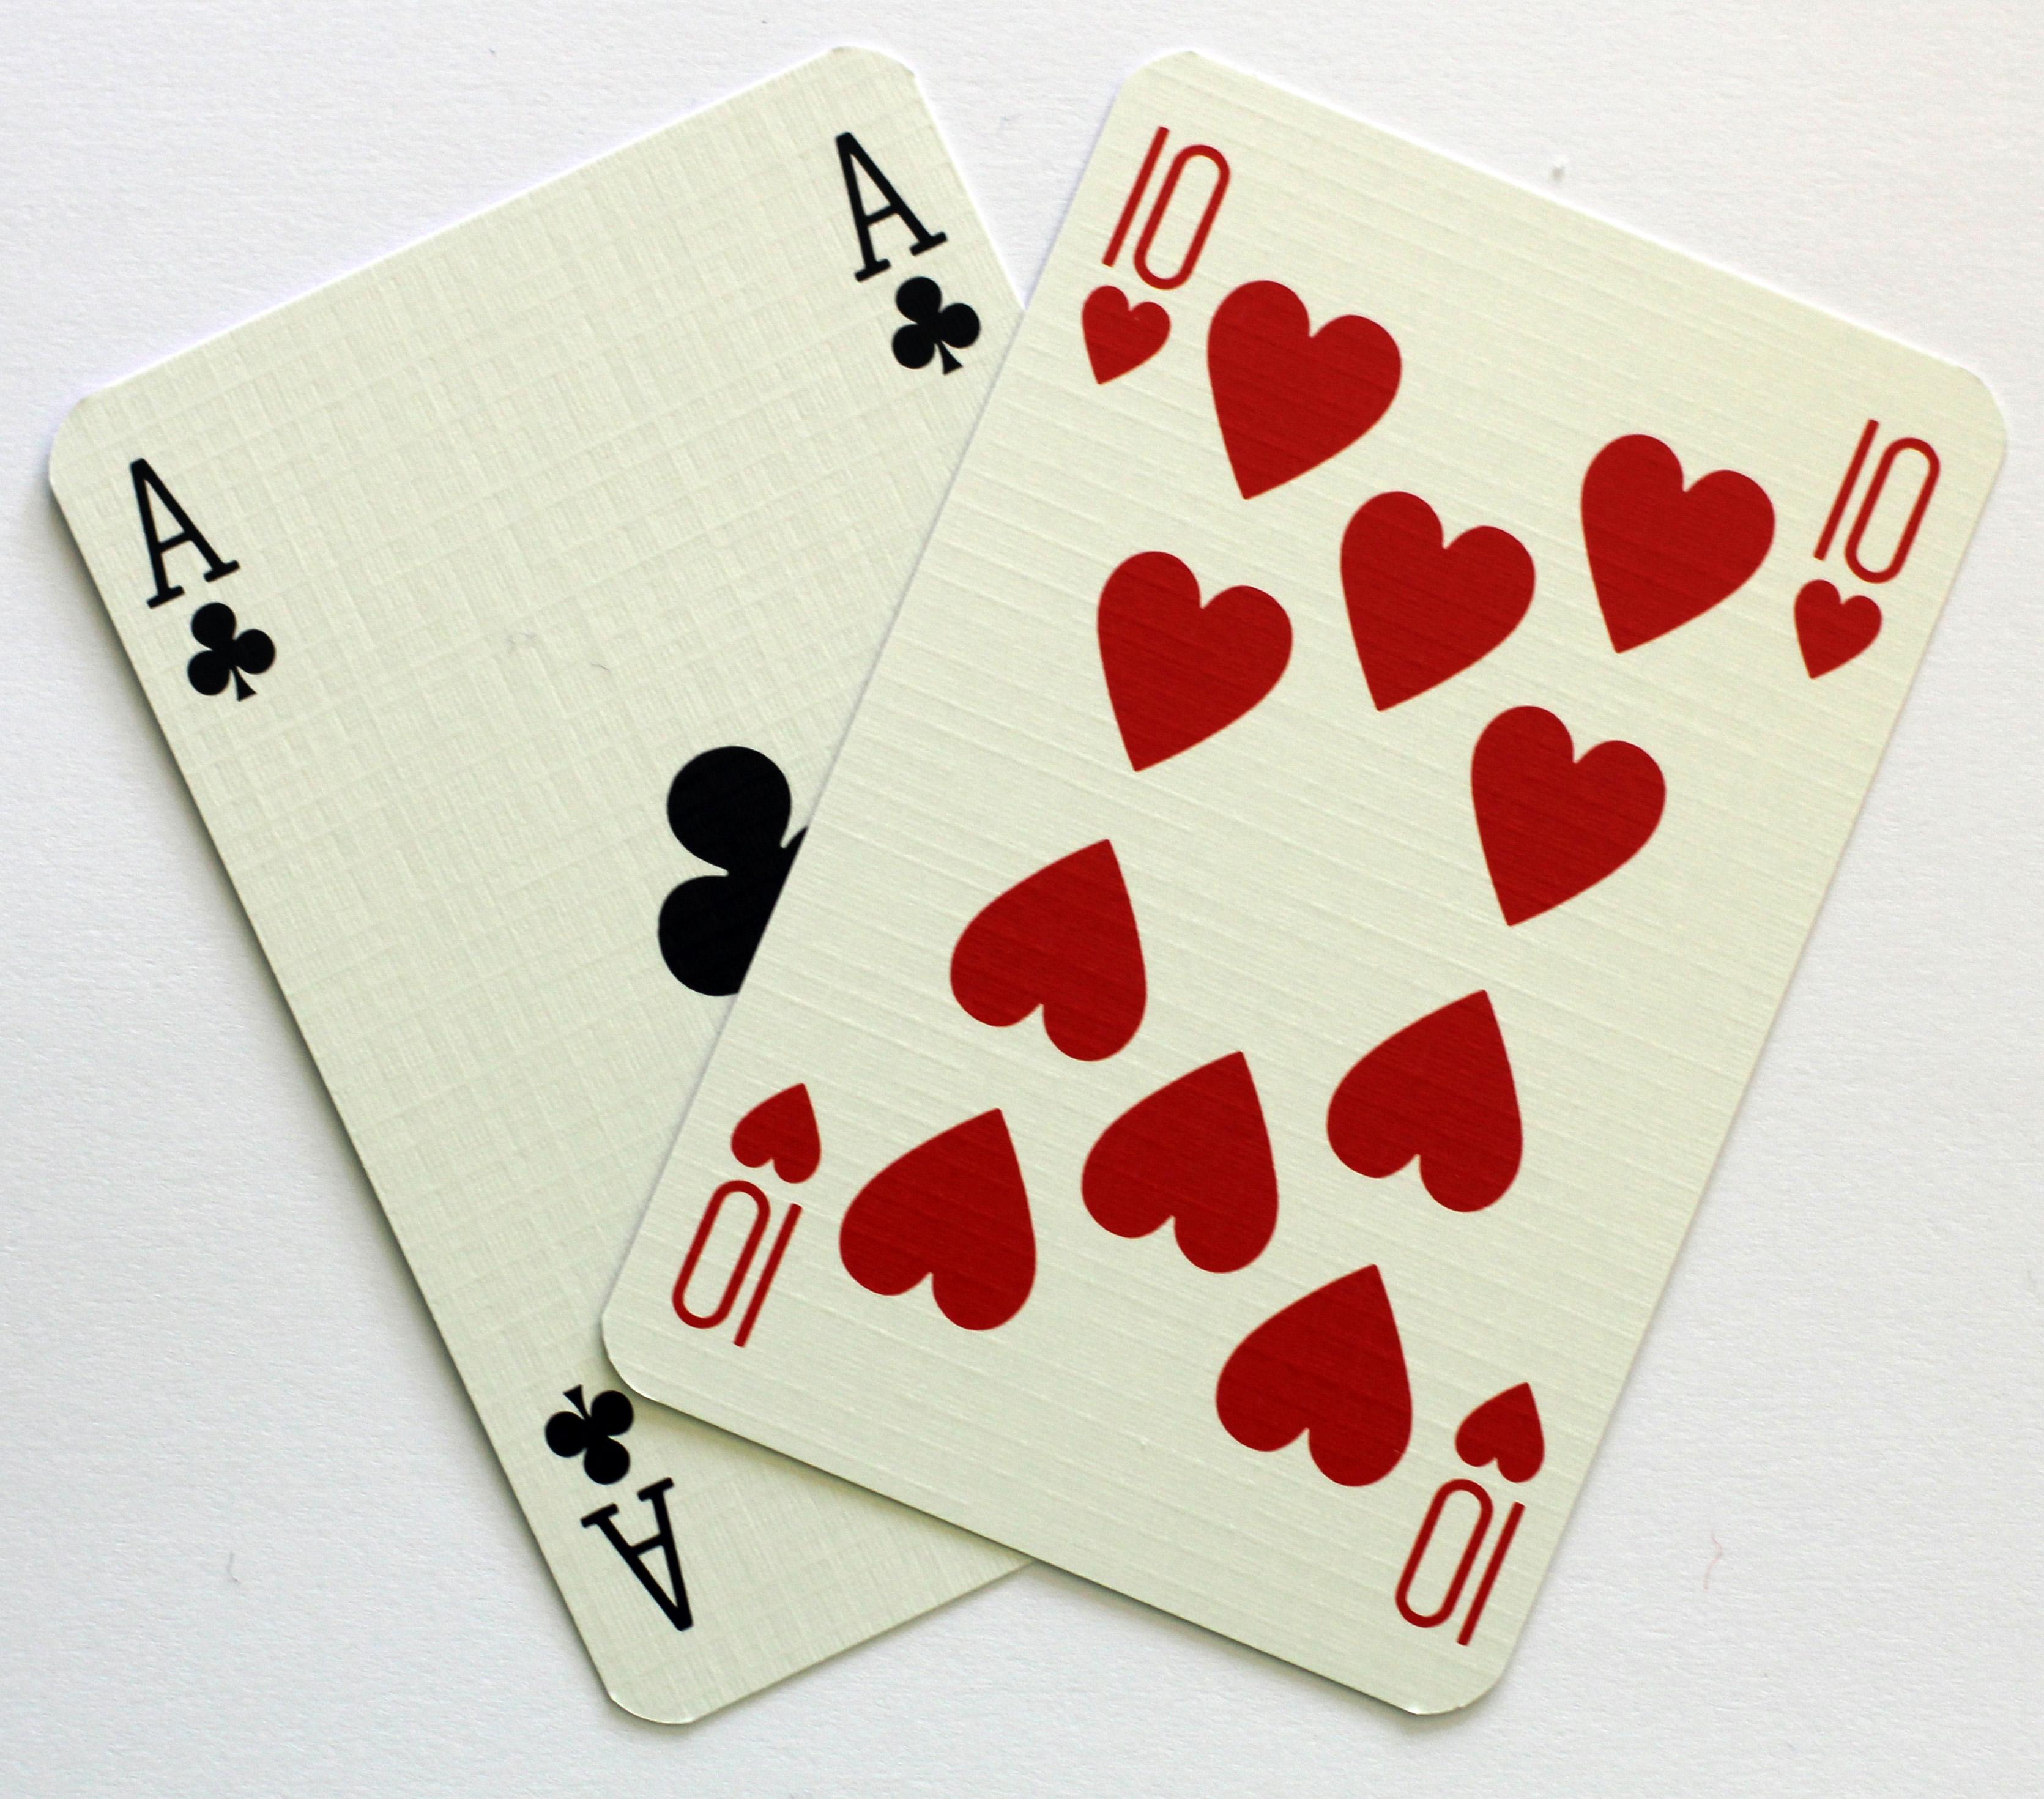 Pontoon Card Game Wikipedia